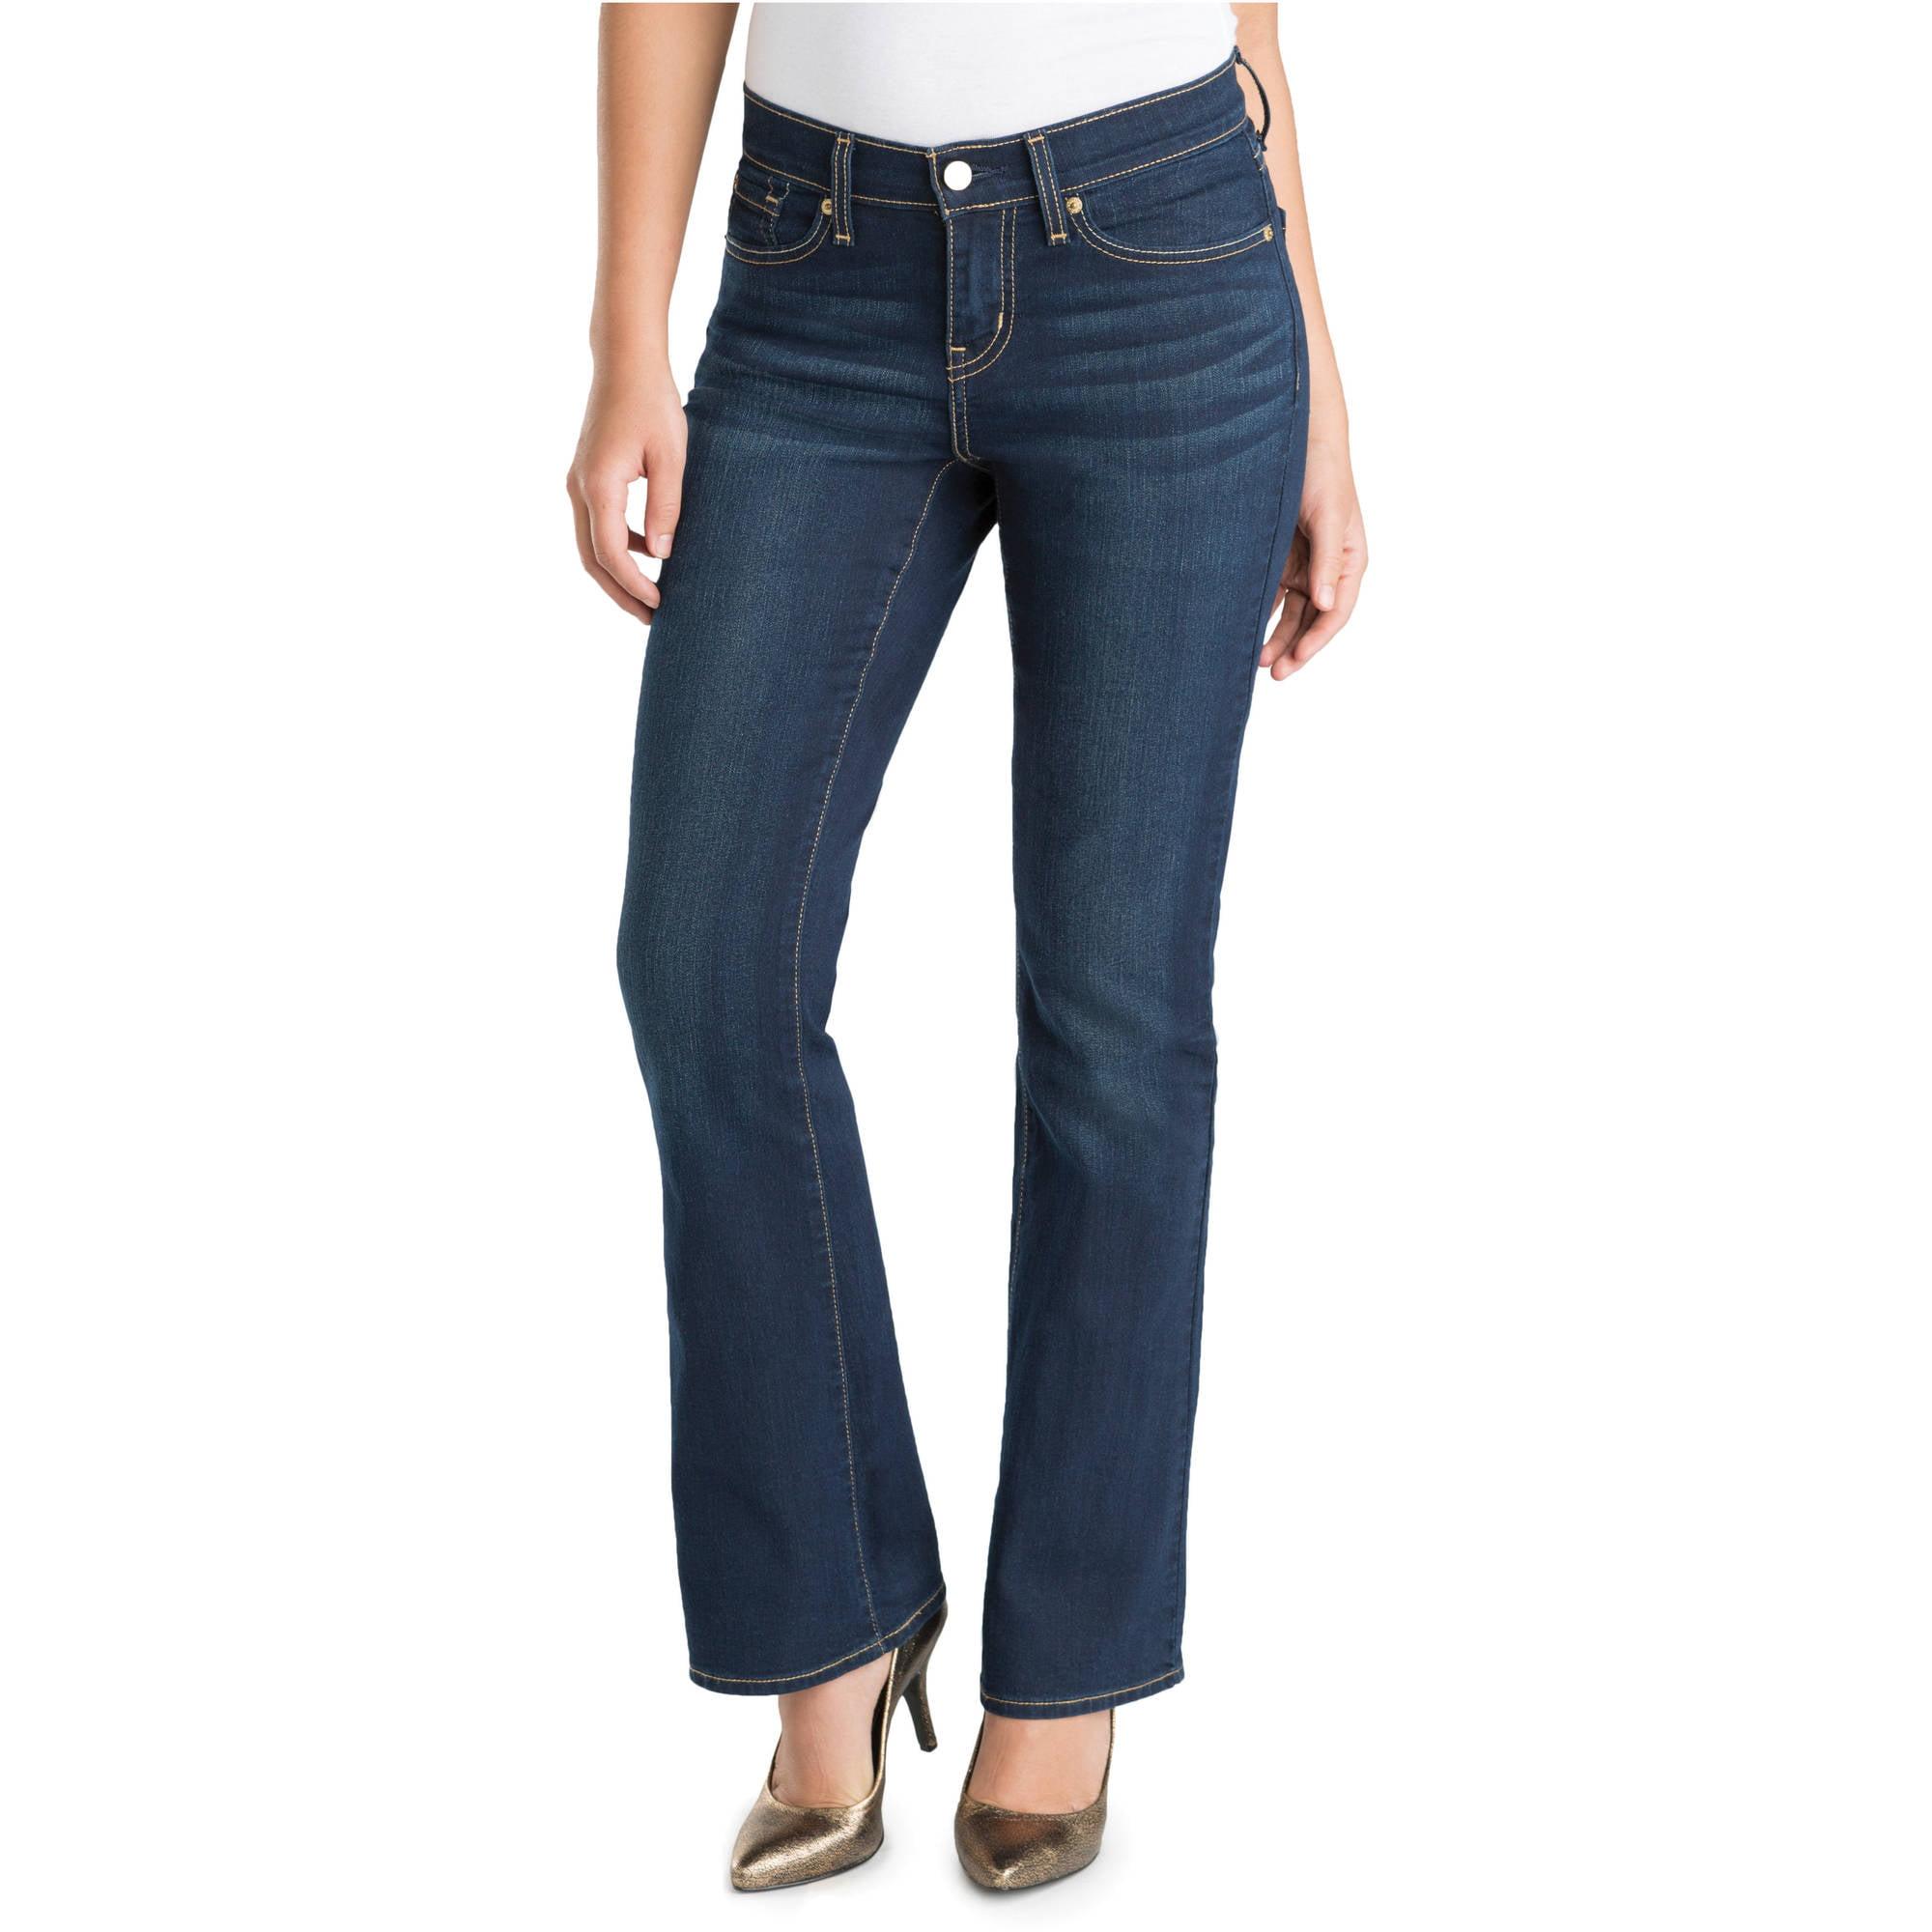 11cc896a0c2 Signature by Levi Strauss & Co. Women's Curvy Bootcut Jeans - Walmart.com